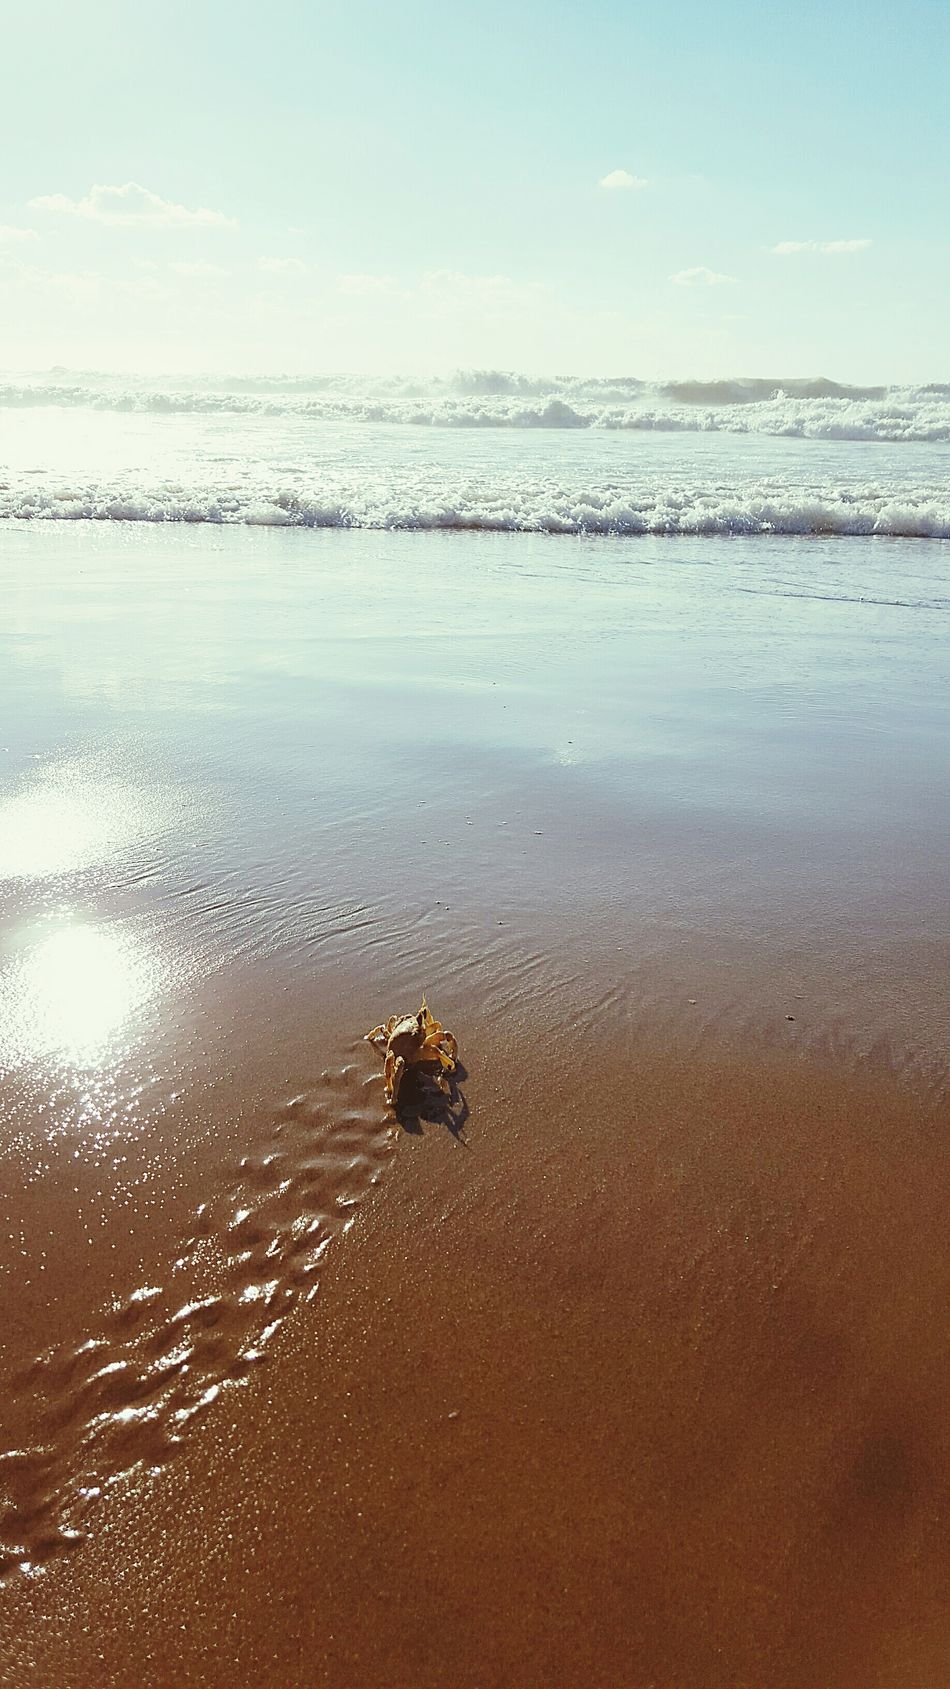 Showcase: January January2016 Mediterranean  Sand Sea Sun Waves Crab Kámoš Nature The Week Of Eyeem EyeEm Best Shots The Great Outdoors - 2016 EyeEm Awards The Great Outdoors With Adobe Miles Away